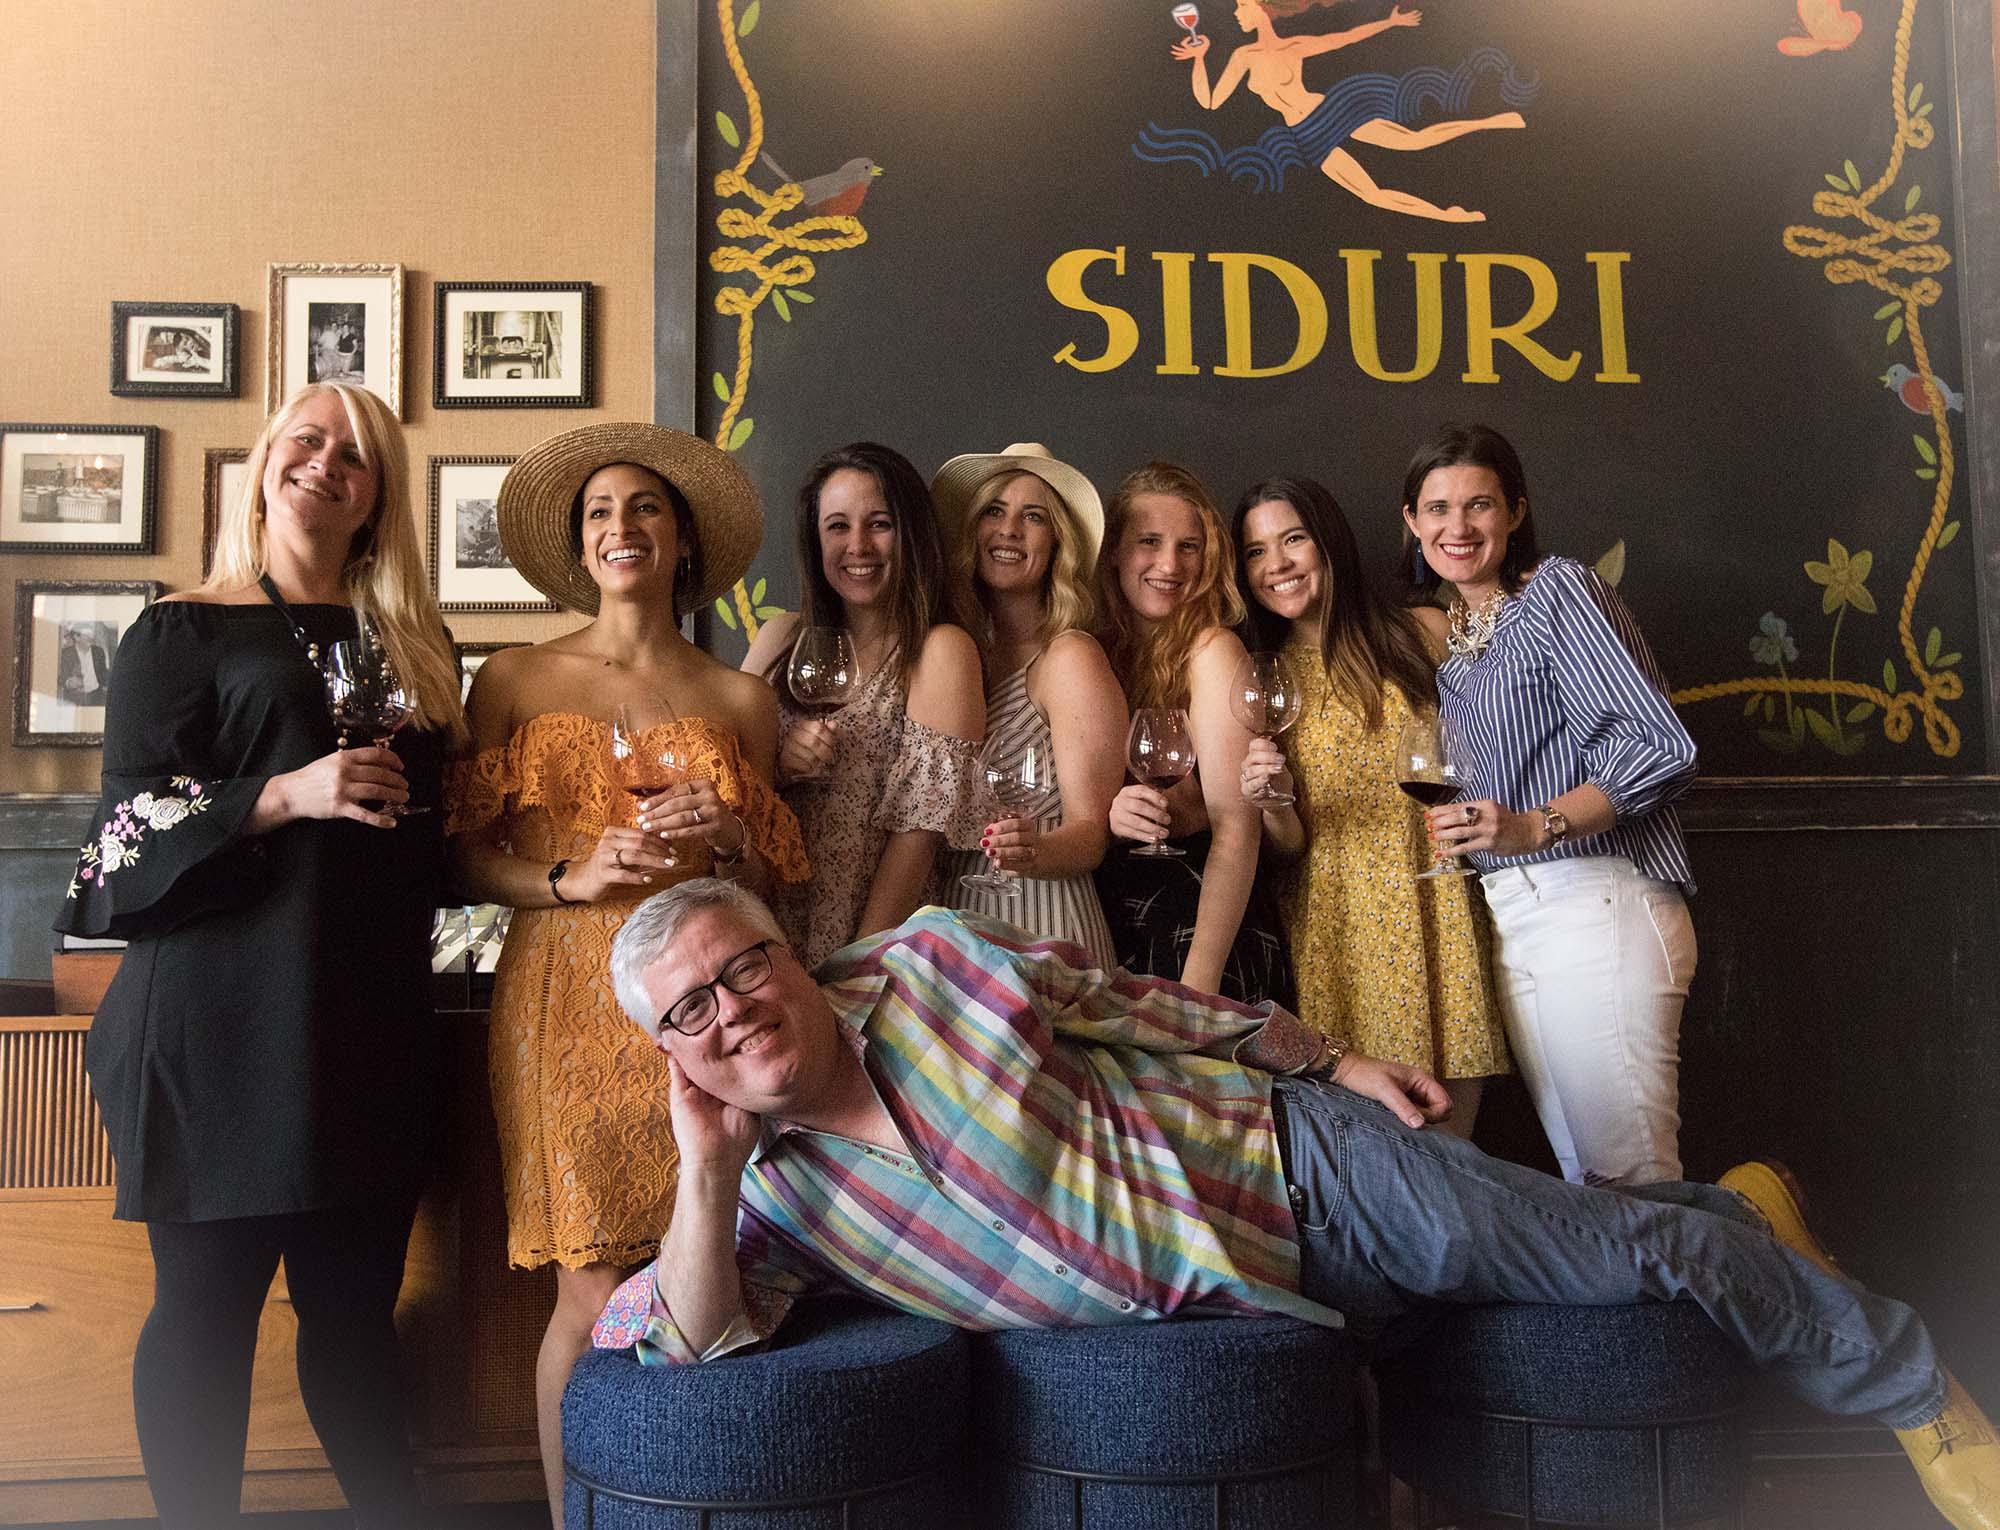 Food & Wine pairing at  The Siduri Wine Bar & Tasting Lounge  led by Siduri Winemaker Adam Lee during a Healdsburg Bloggers weekend